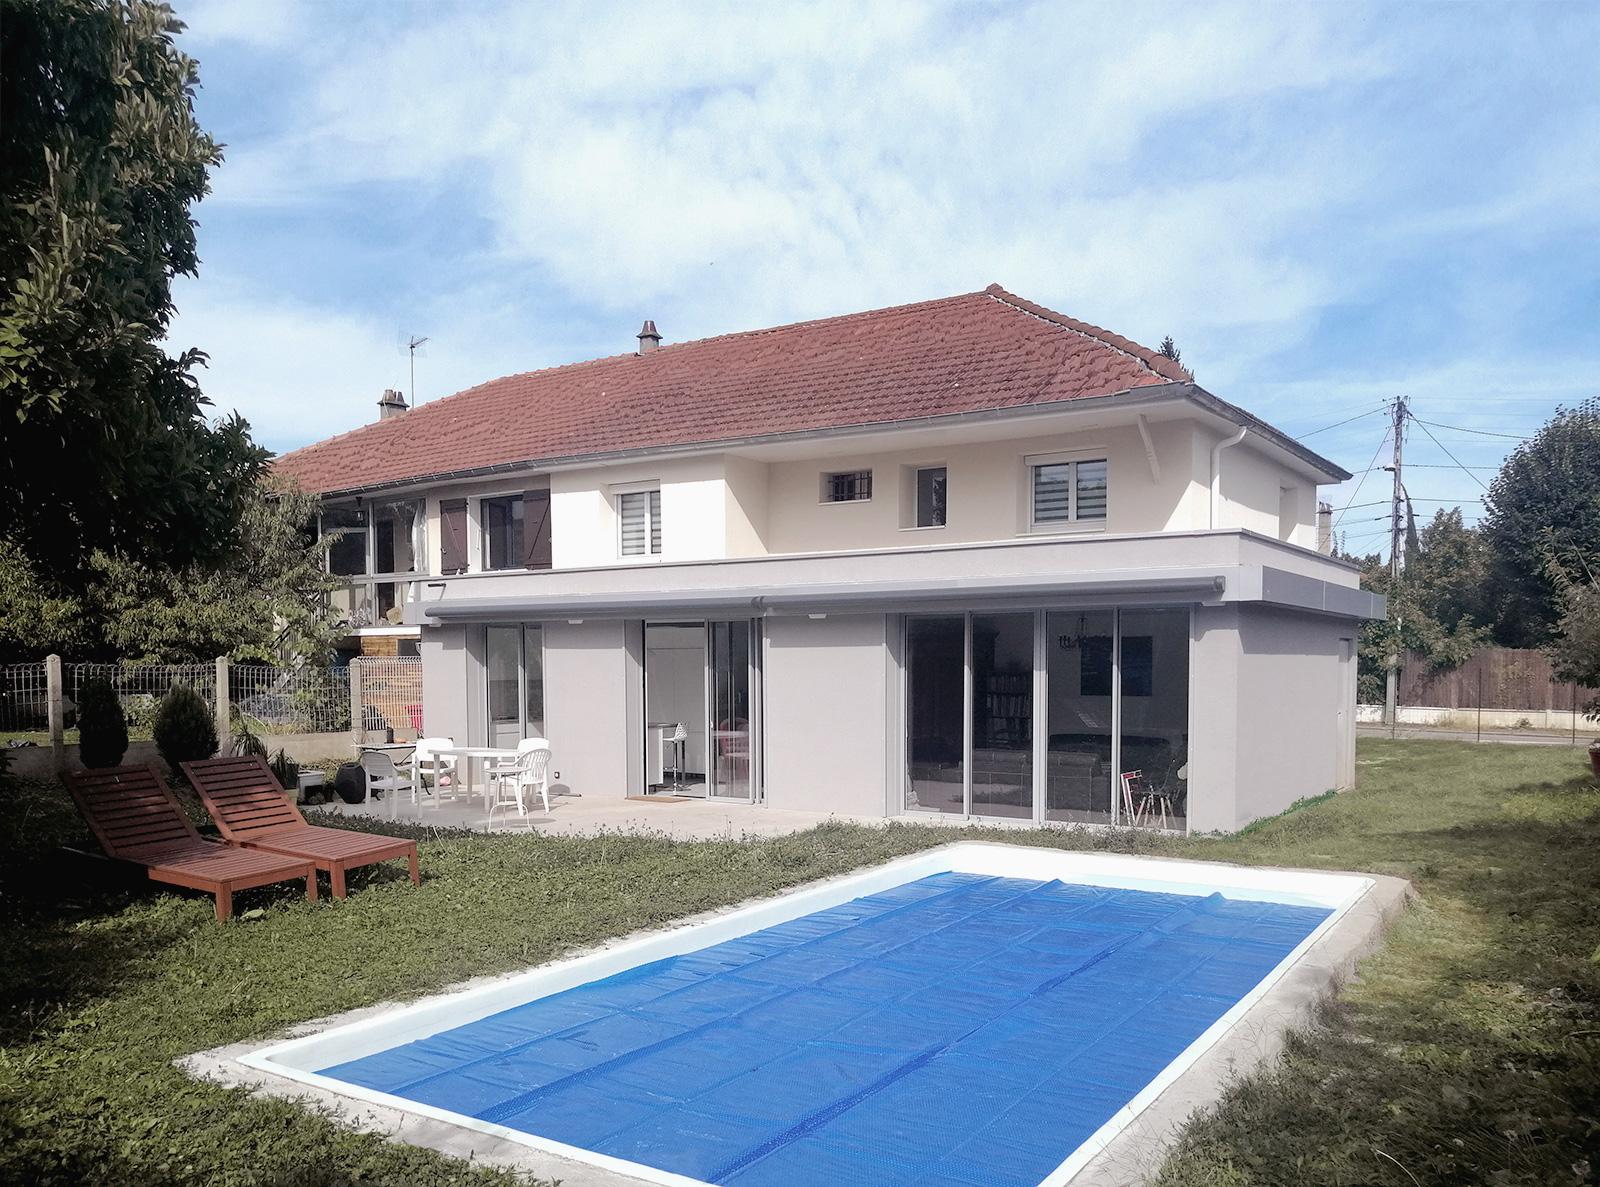 maison plan favier Lyon Tassin réhabilitation extension transformation toit terrasse chantier